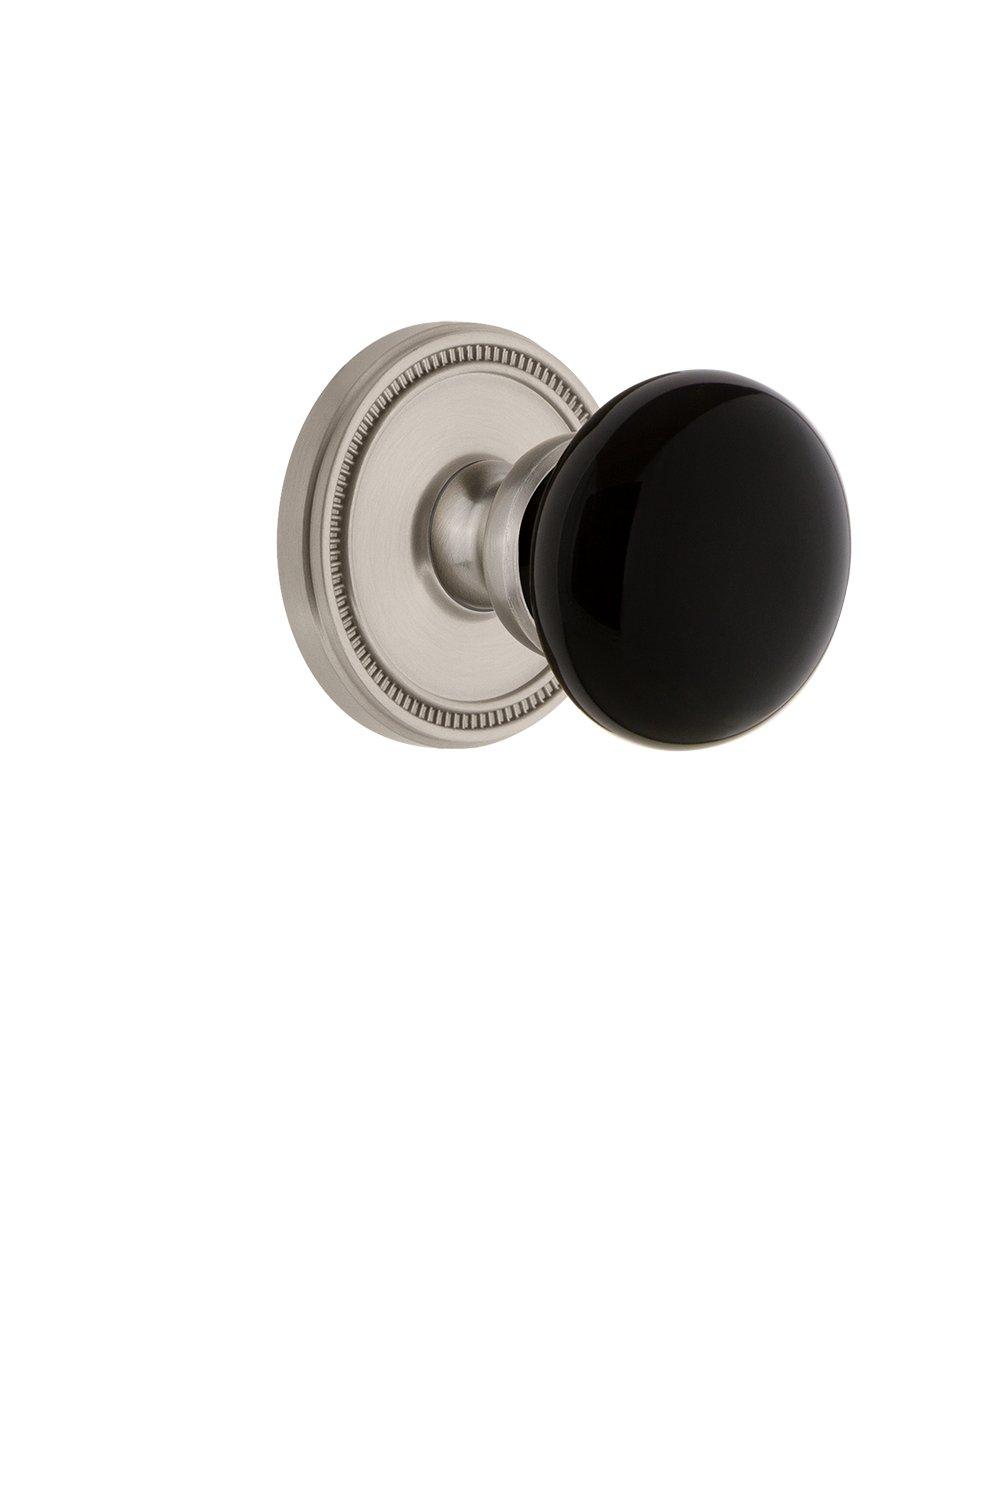 2.75 Polished Brass Grandeur Hardware 853051 Soleil Rosette with Coventry Knob Privacy Backset Size